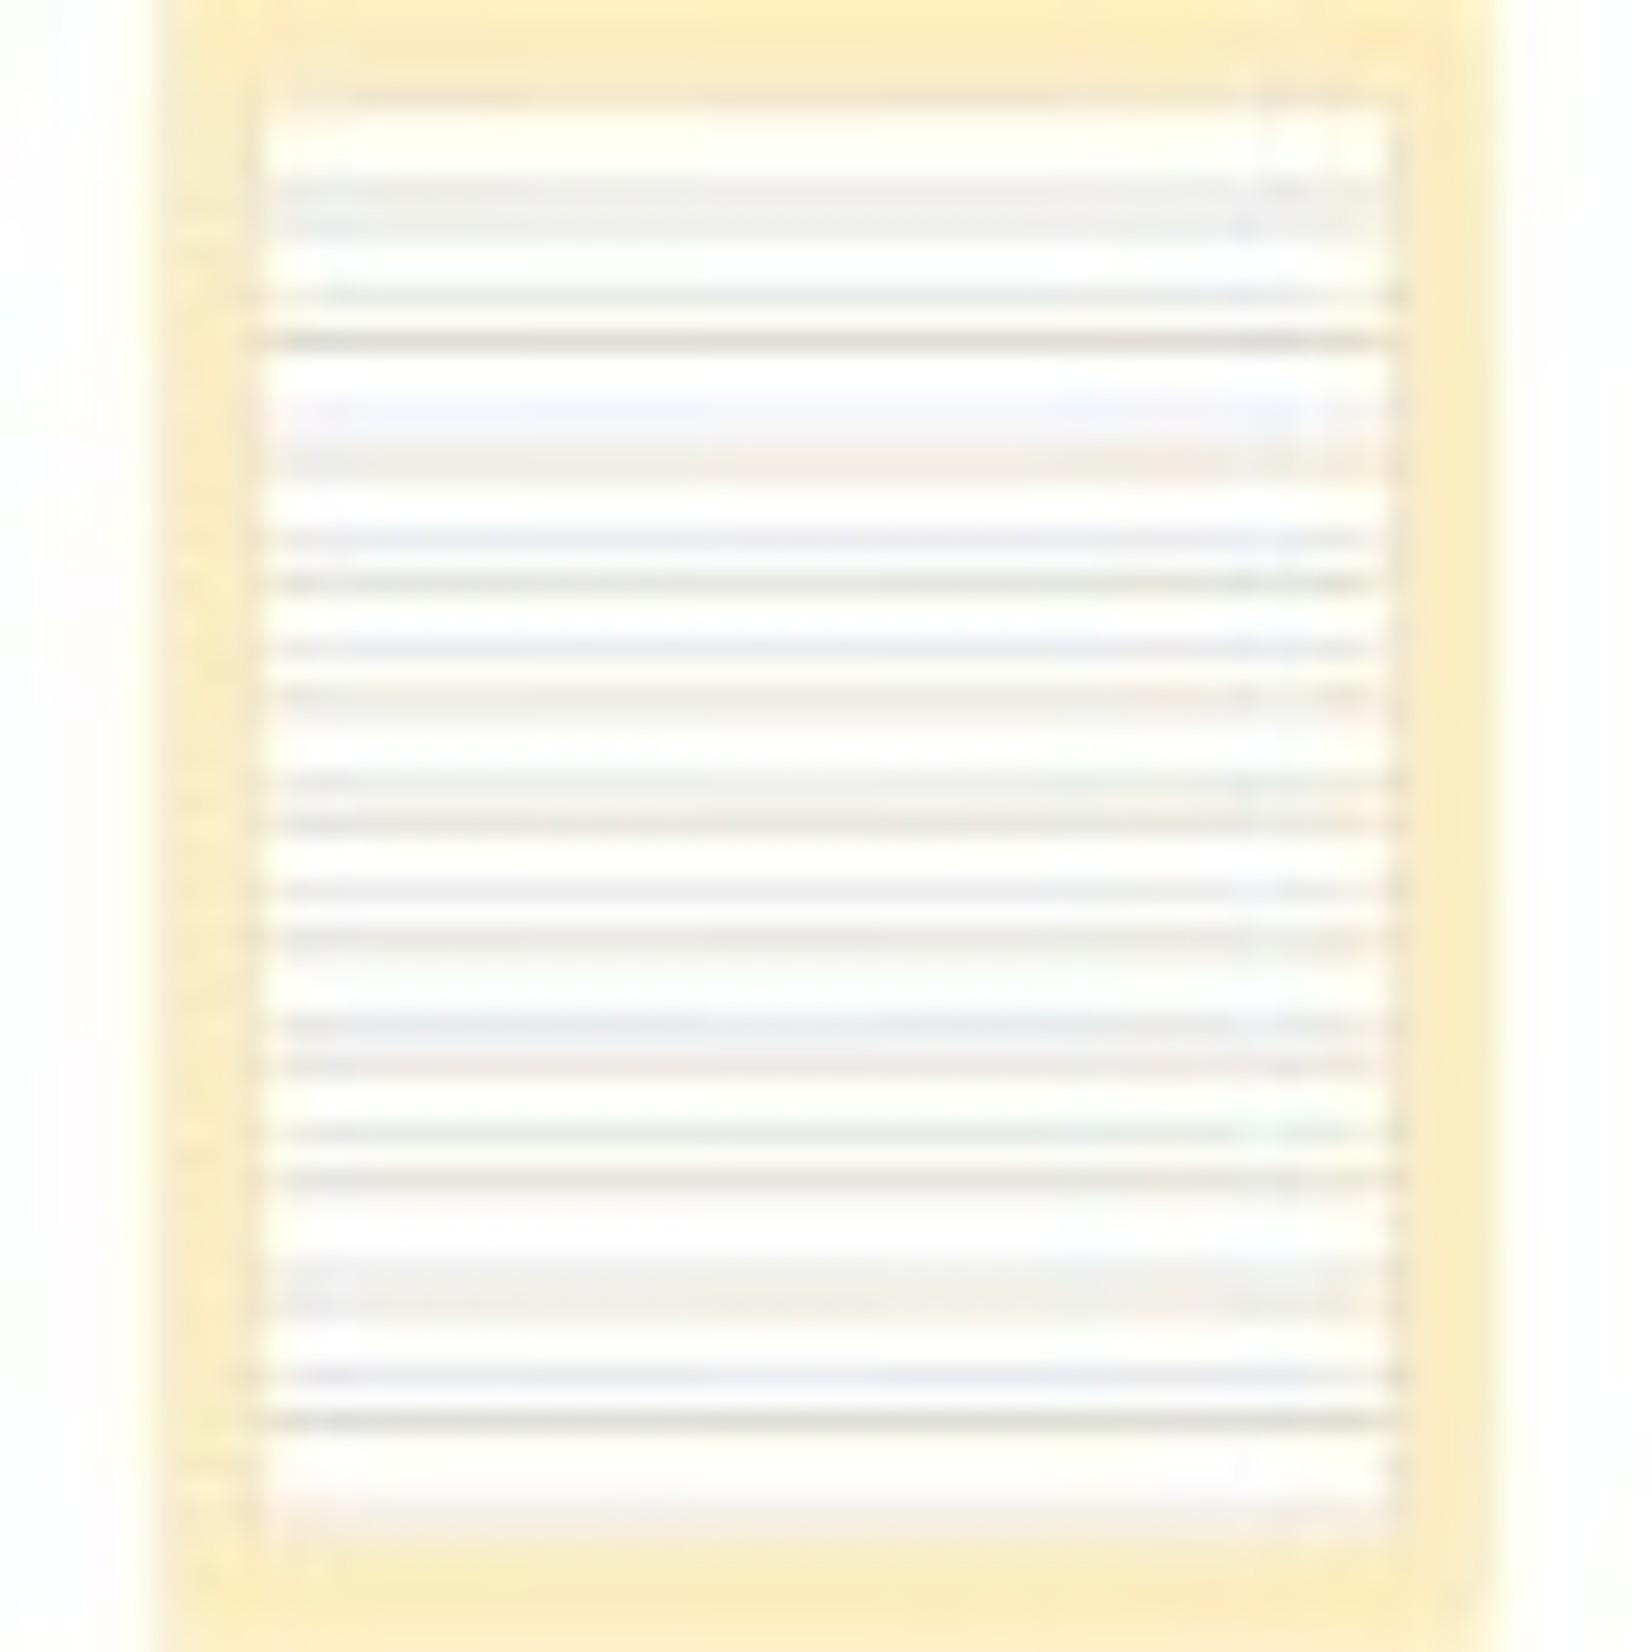 Formati Formati S4 Schreiben Quart 4li